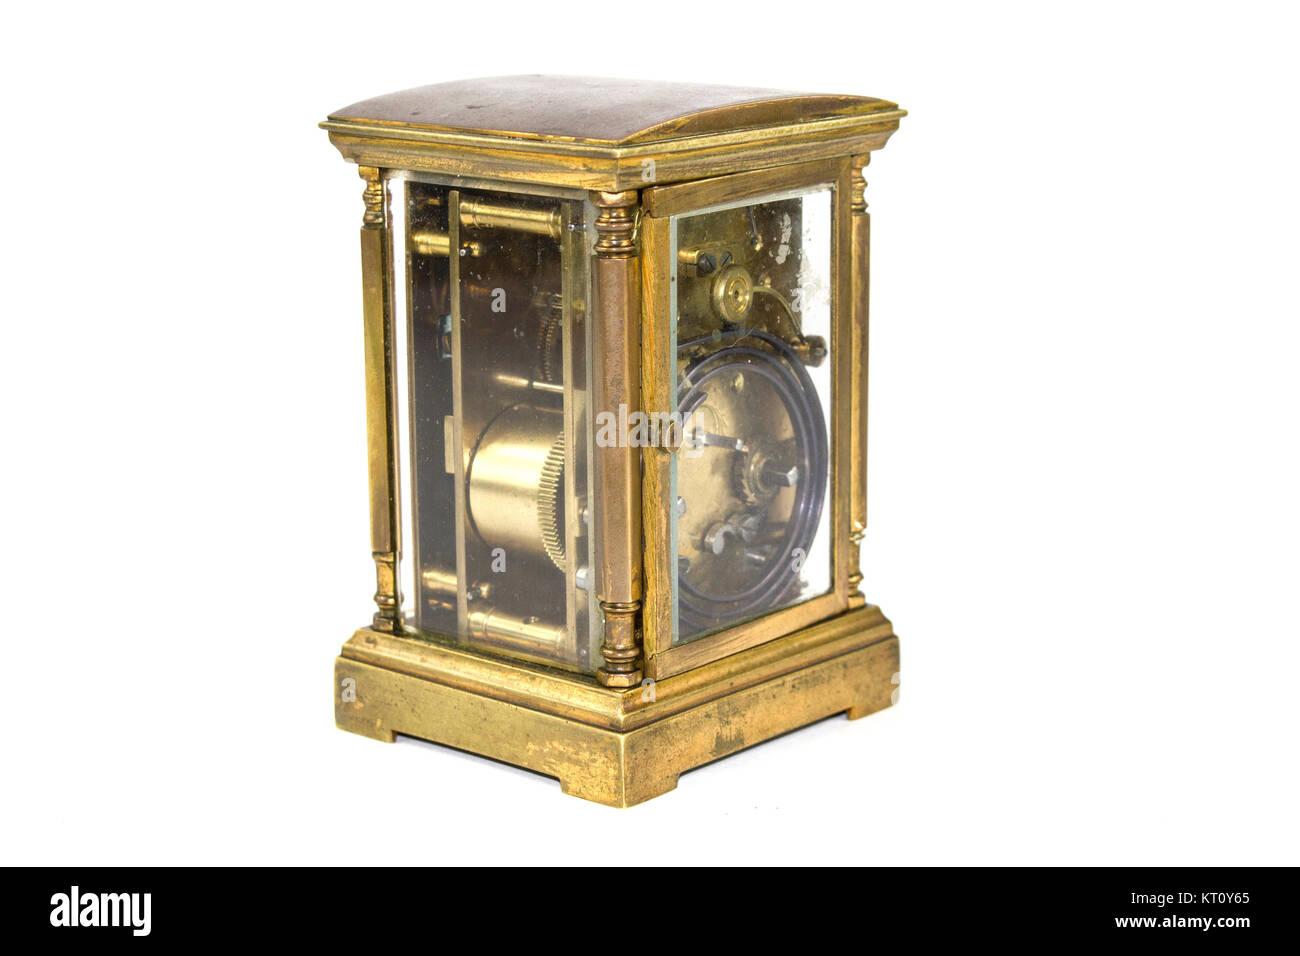 Vintage Timepiece Clock on White Background - Stock Image